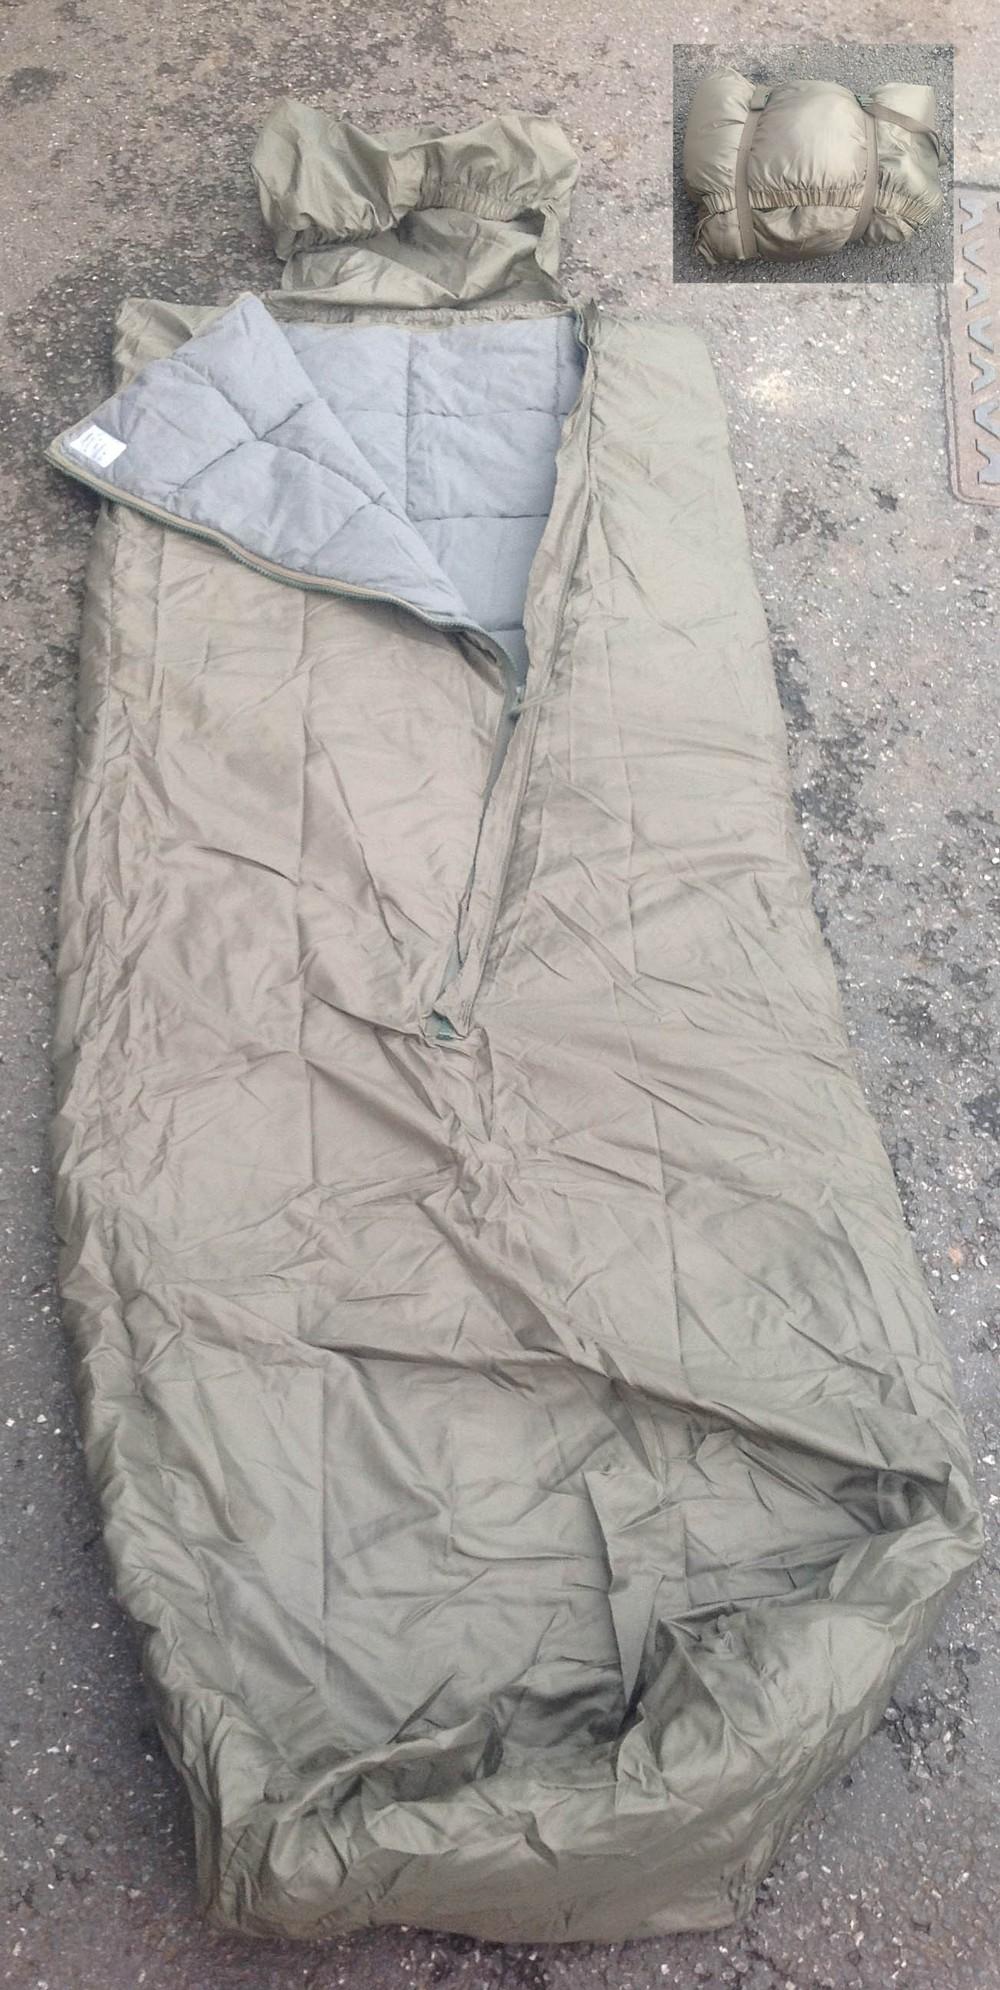 MILITARY SURPLUS French Army Sleeping Bag